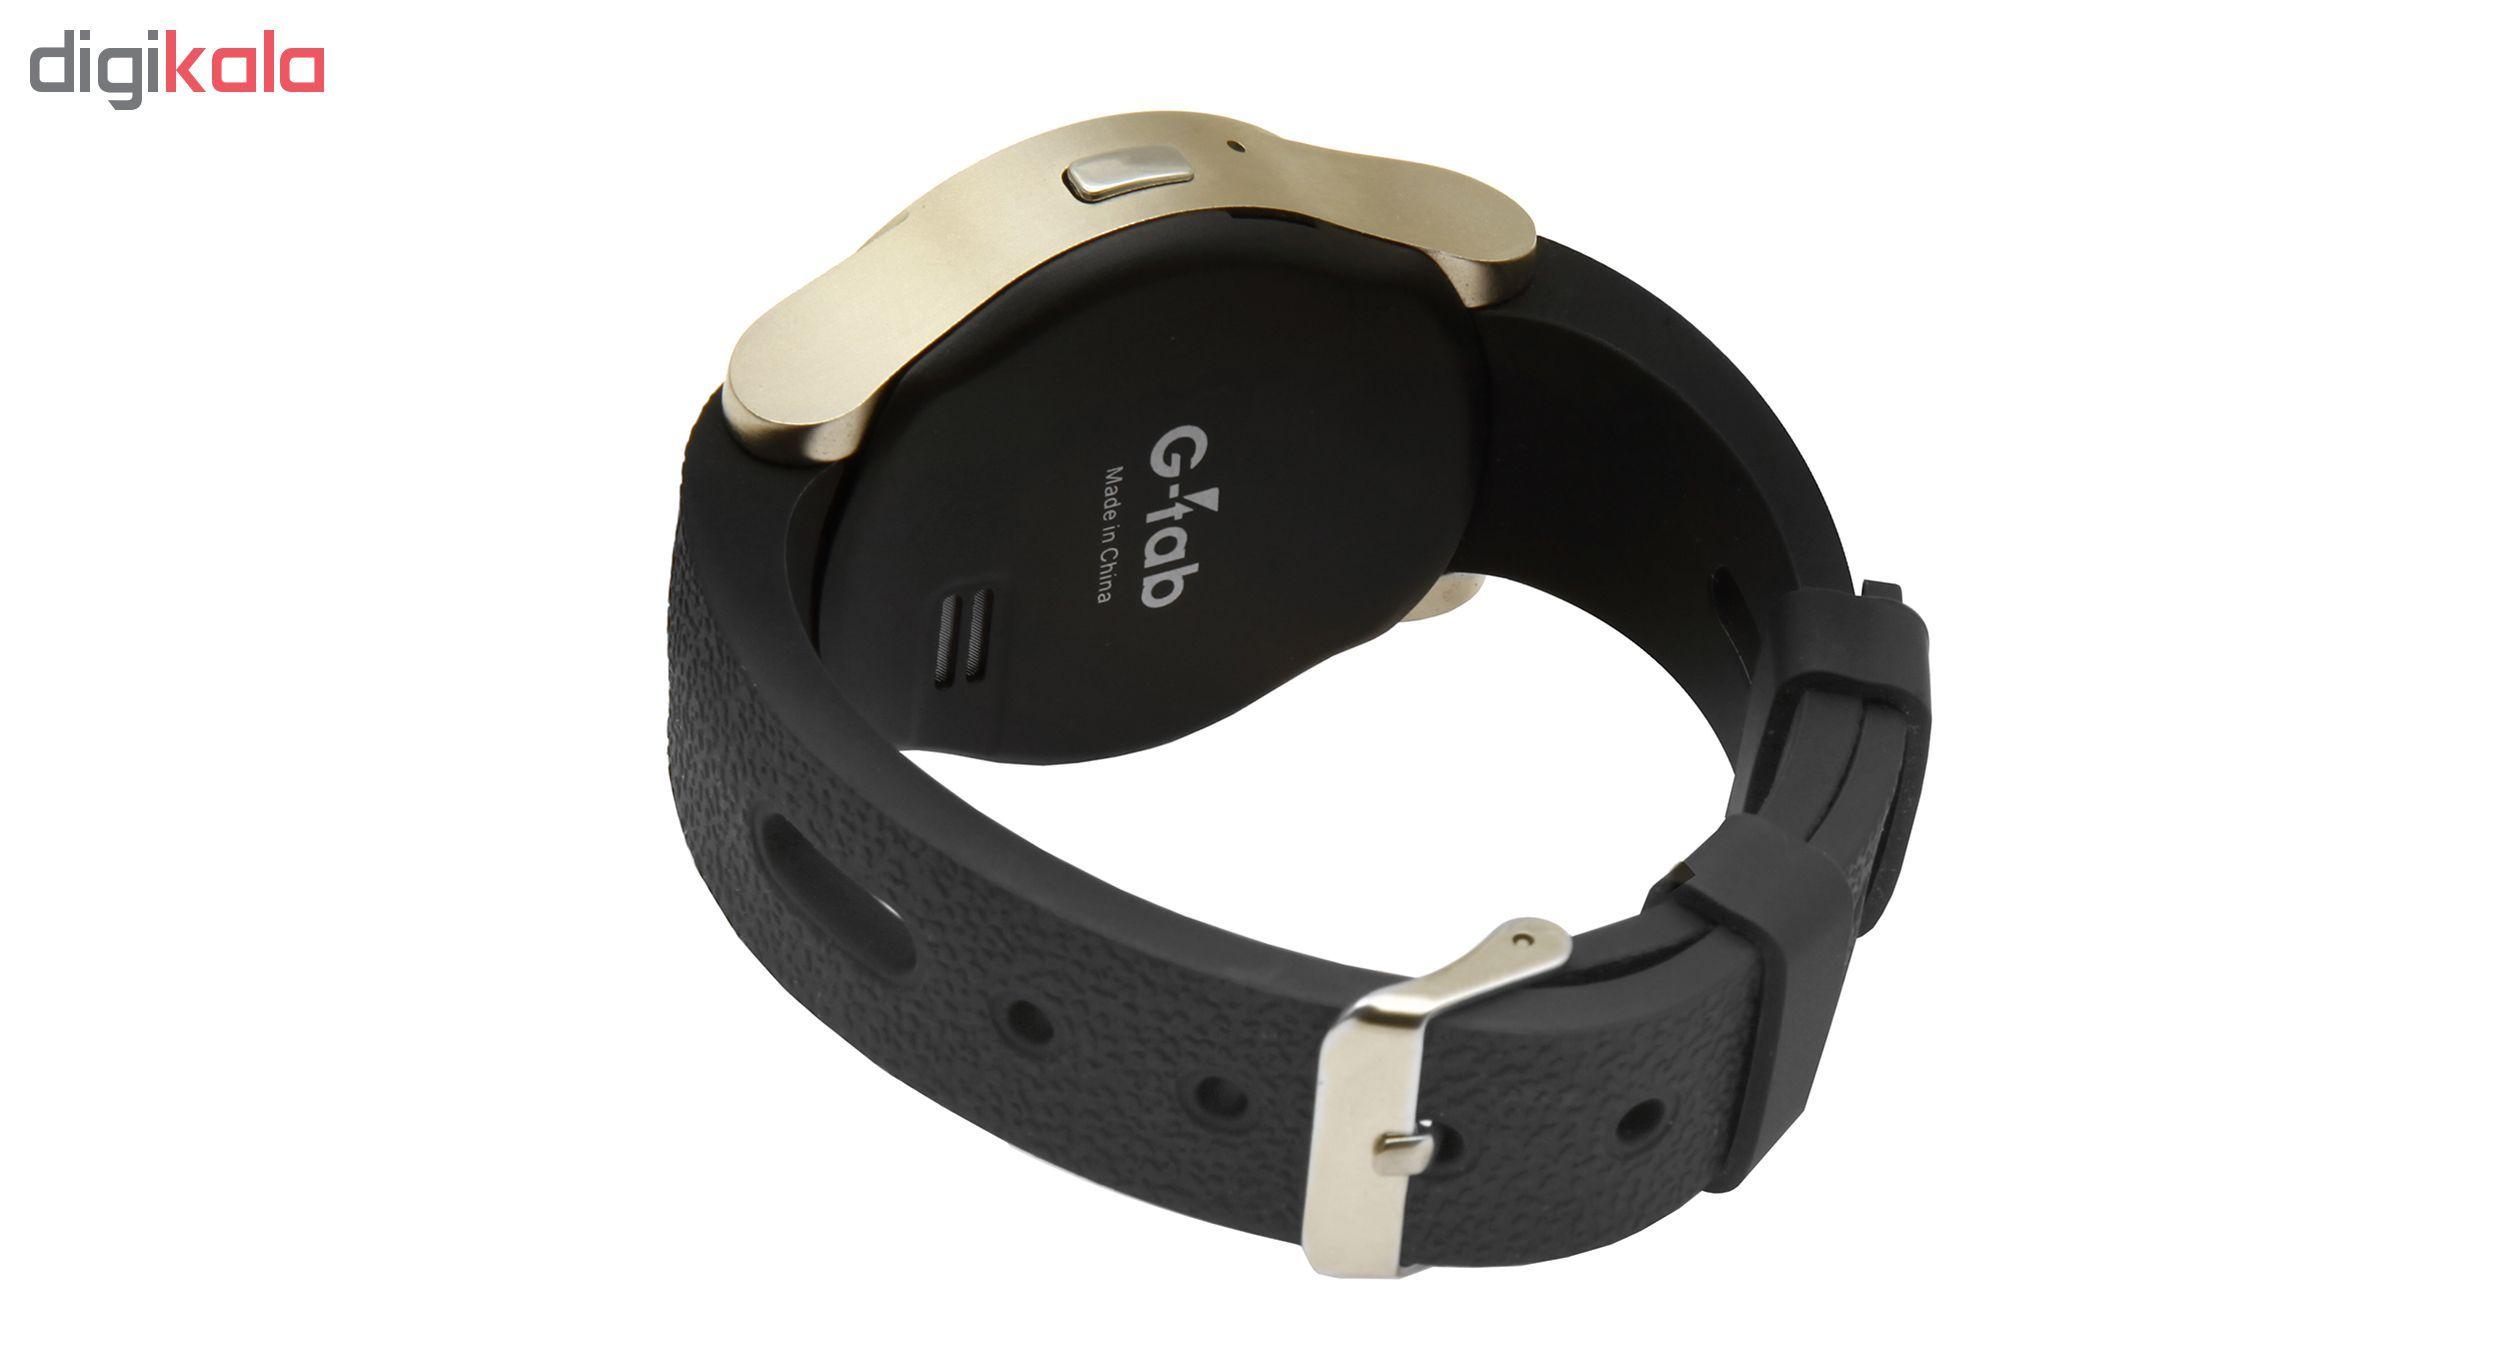 ساعت هوشمند جی تب مدل S1 main 1 12